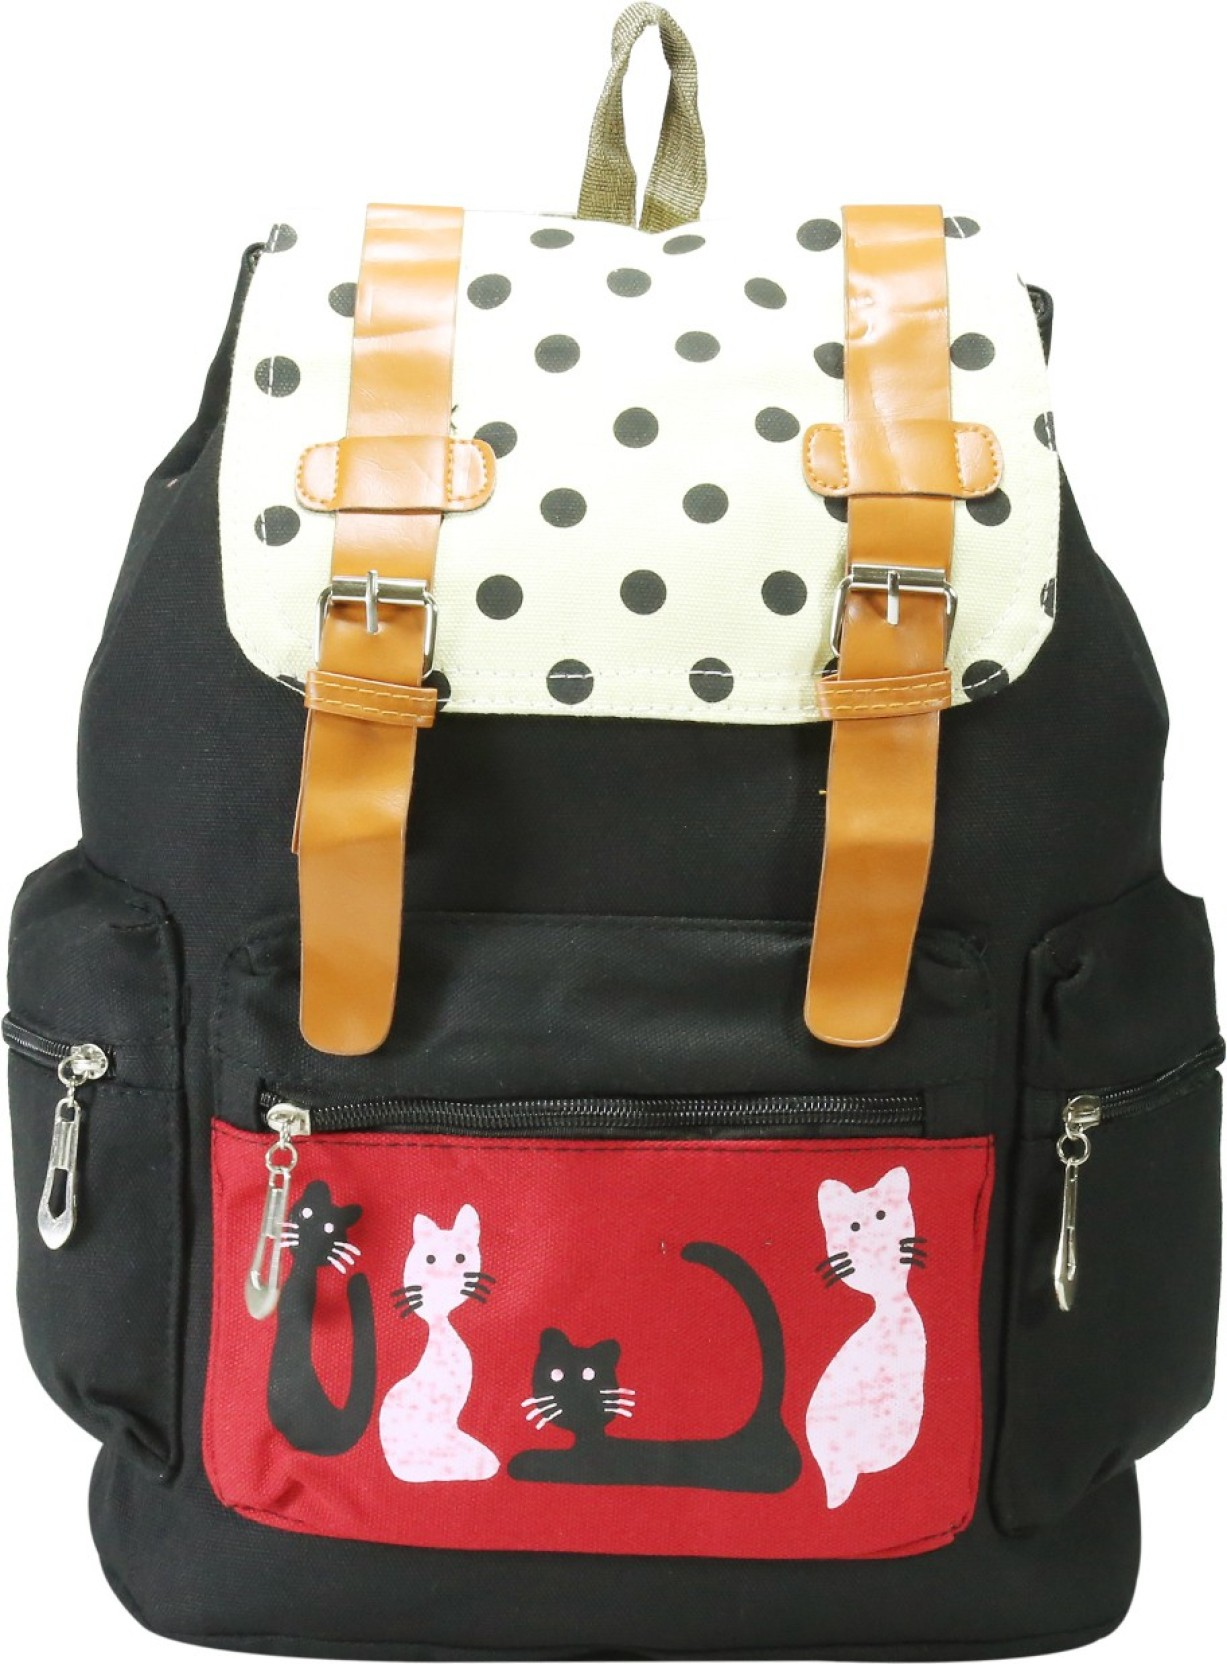 Cheap Stylish Backpacks For College- Fenix Toulouse Handball e5db0e3af5c5a